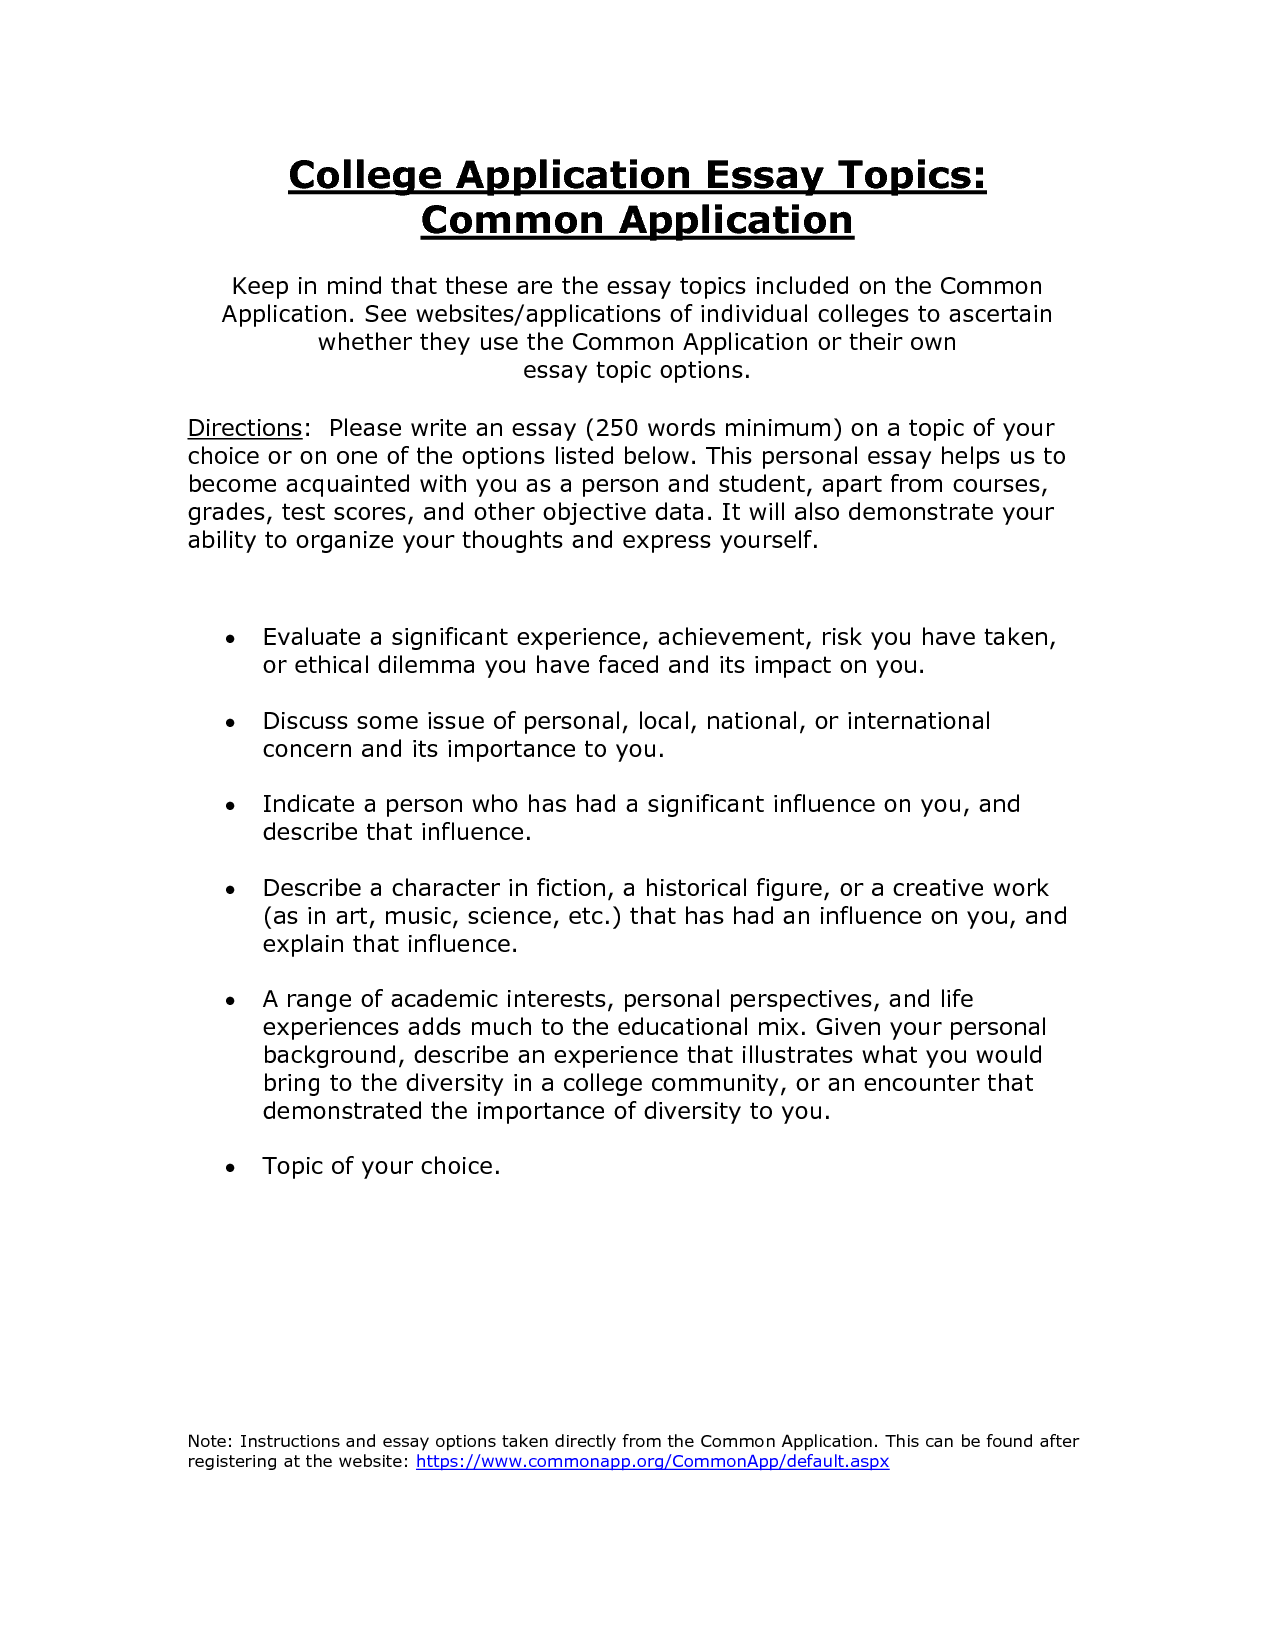 006 Vzmthii0b2 Common App Examples Best Example Essays Application Essay Harvard Prompts 2014-15 Full